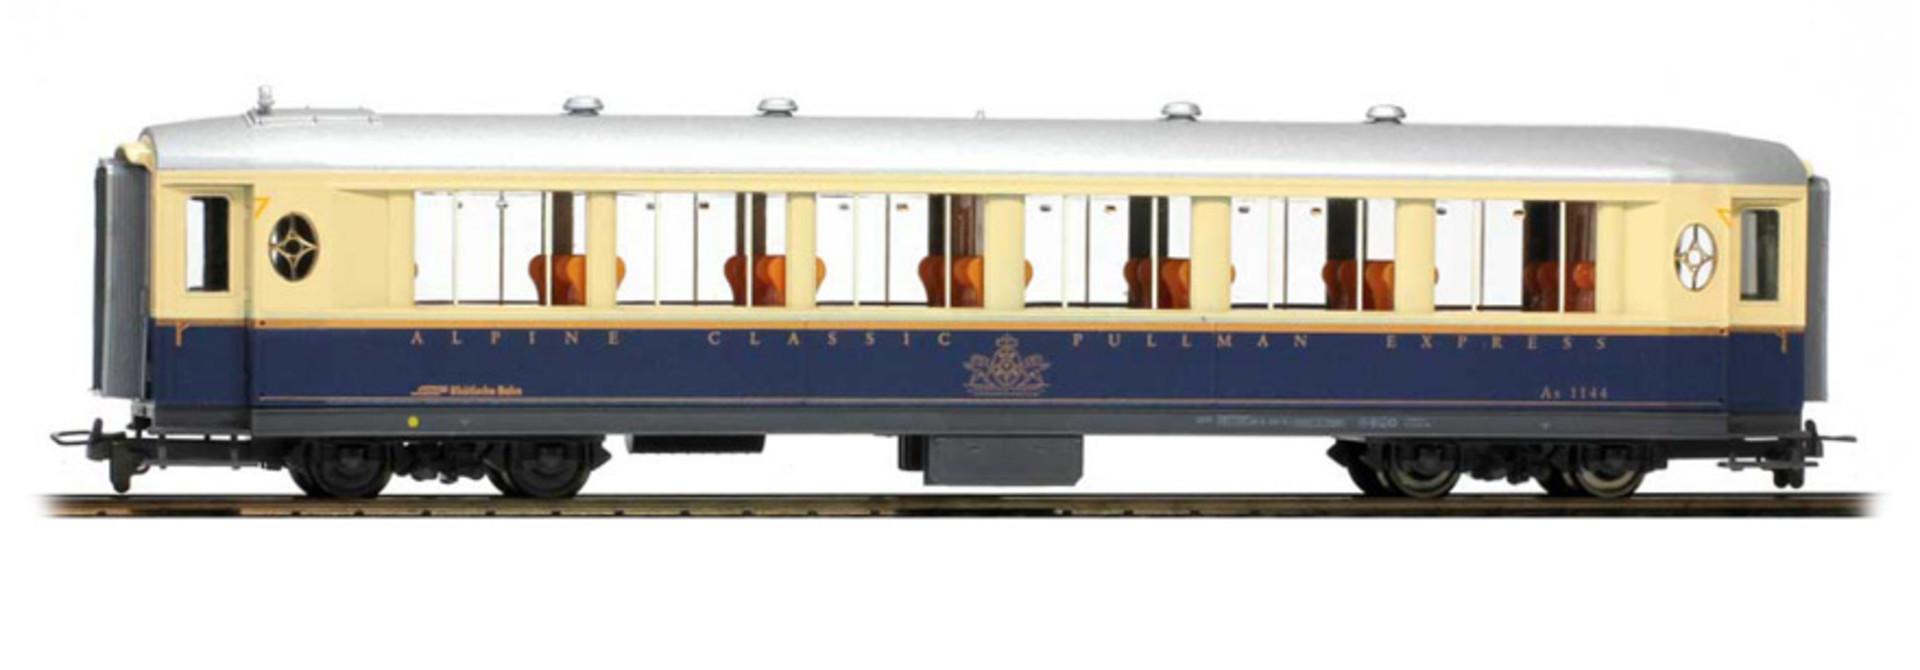 "3272122 RhB As 1142 Salonwagen ""ACPE"""